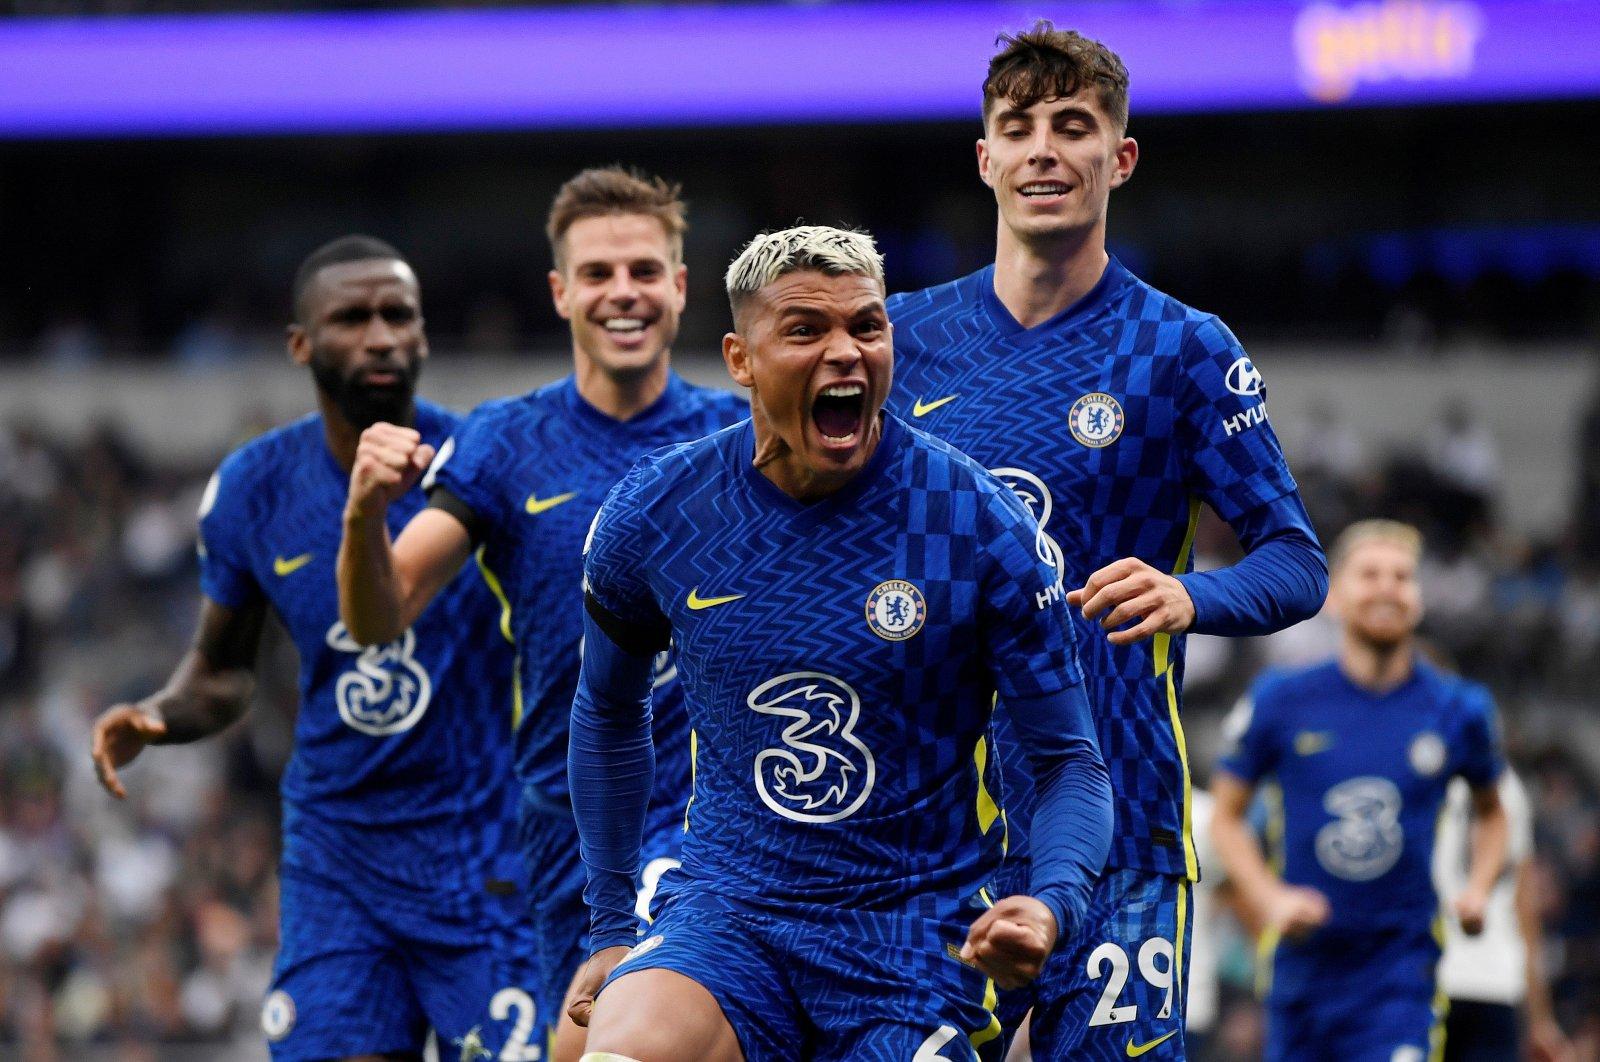 Chelsea's Thiago Silva celebrates with his teammates, afterscoring his team's first goal against Tottenham atTottenham Hotspur Stadium, London, U.K., Sept. 19, 2021. (Reuters Photo)